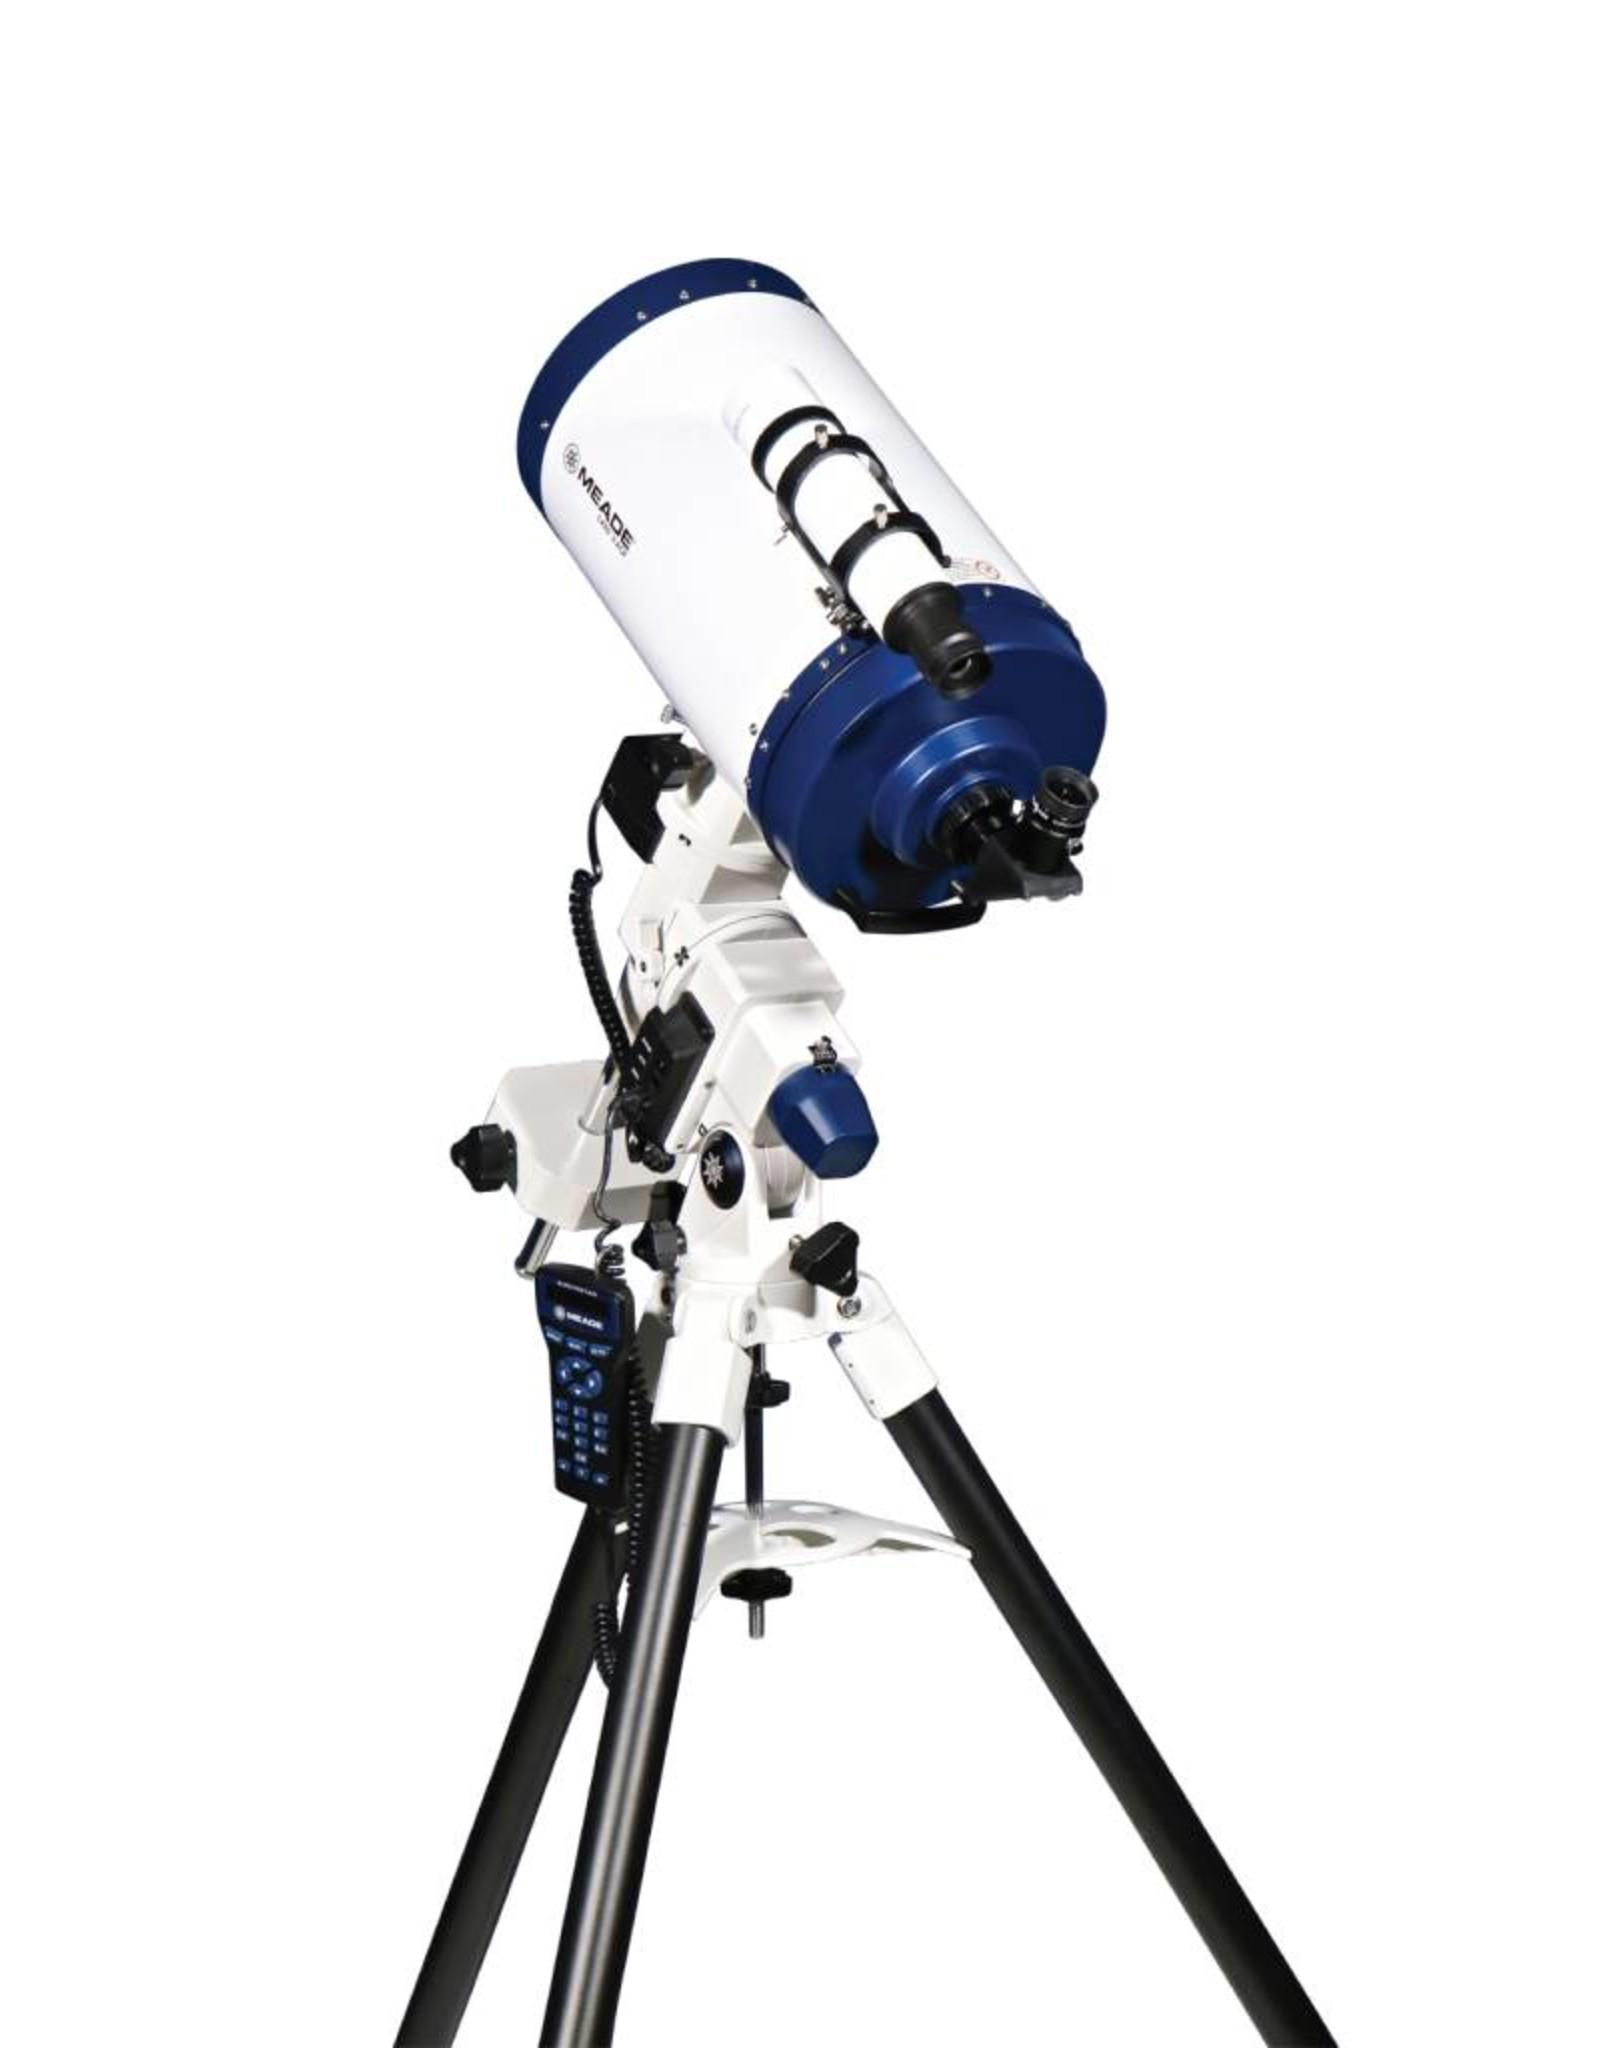 Buy Meade LX65 8 ACF Telescope in online shop